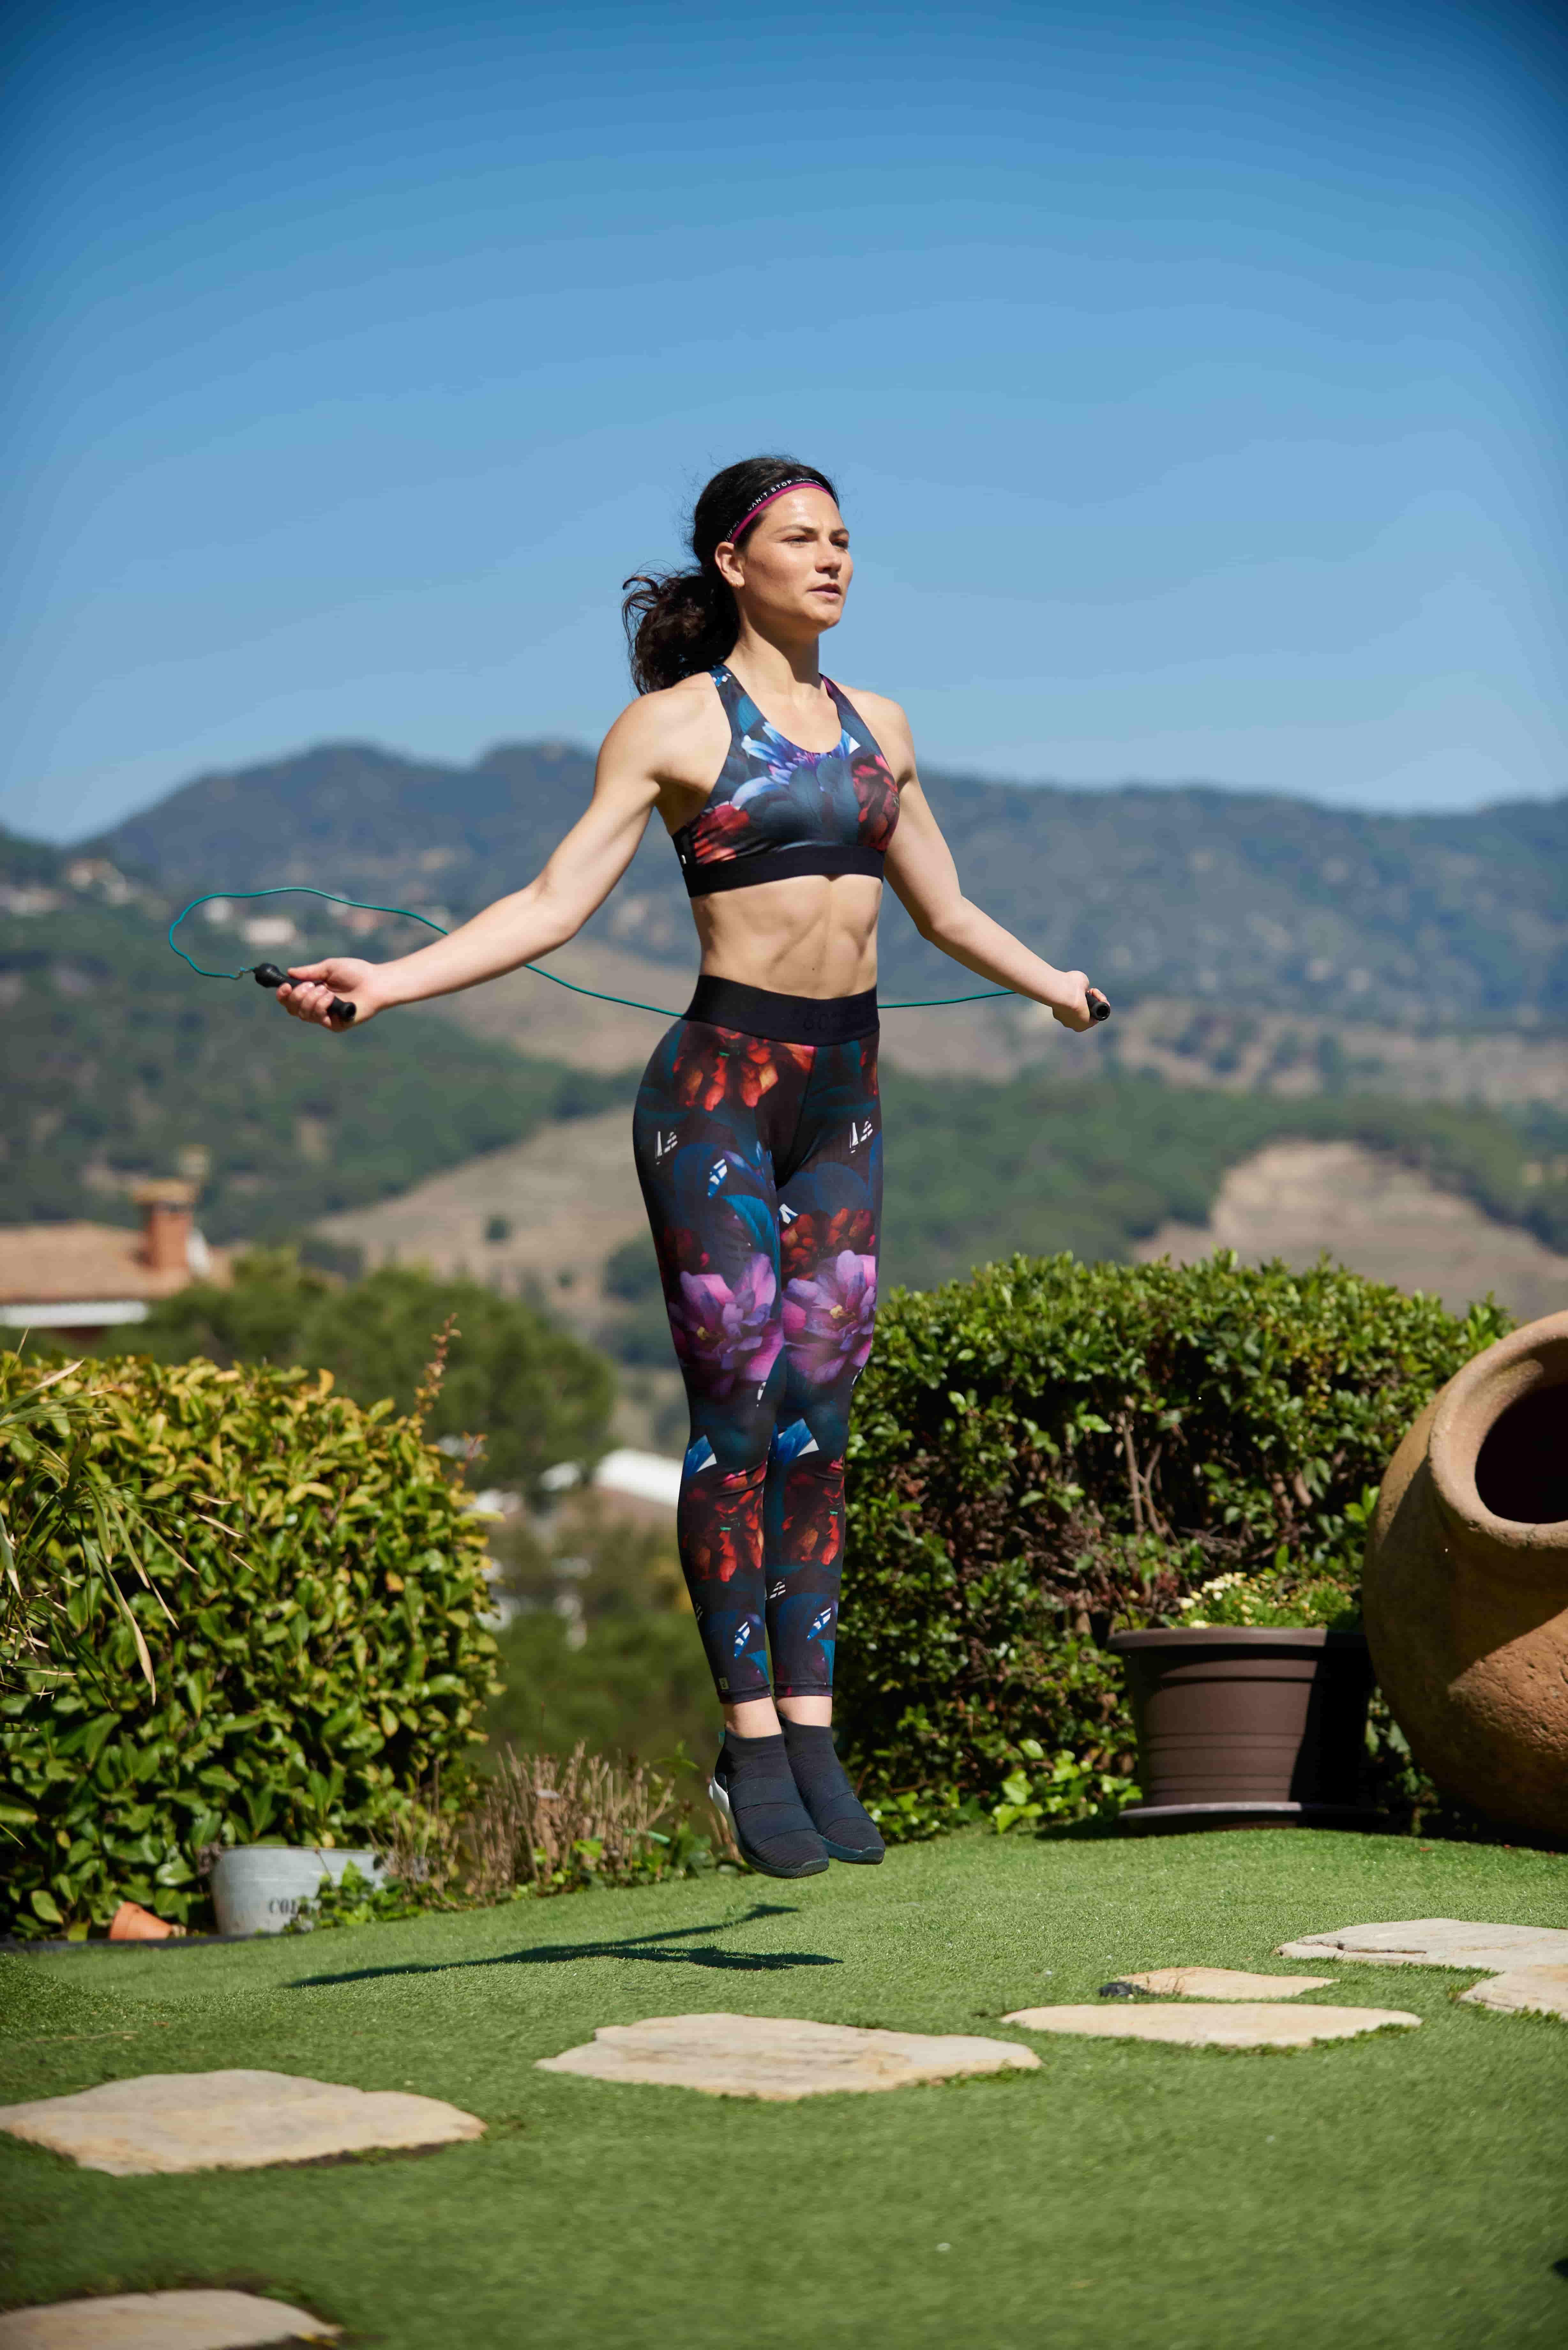 10 Health benefits of skipping